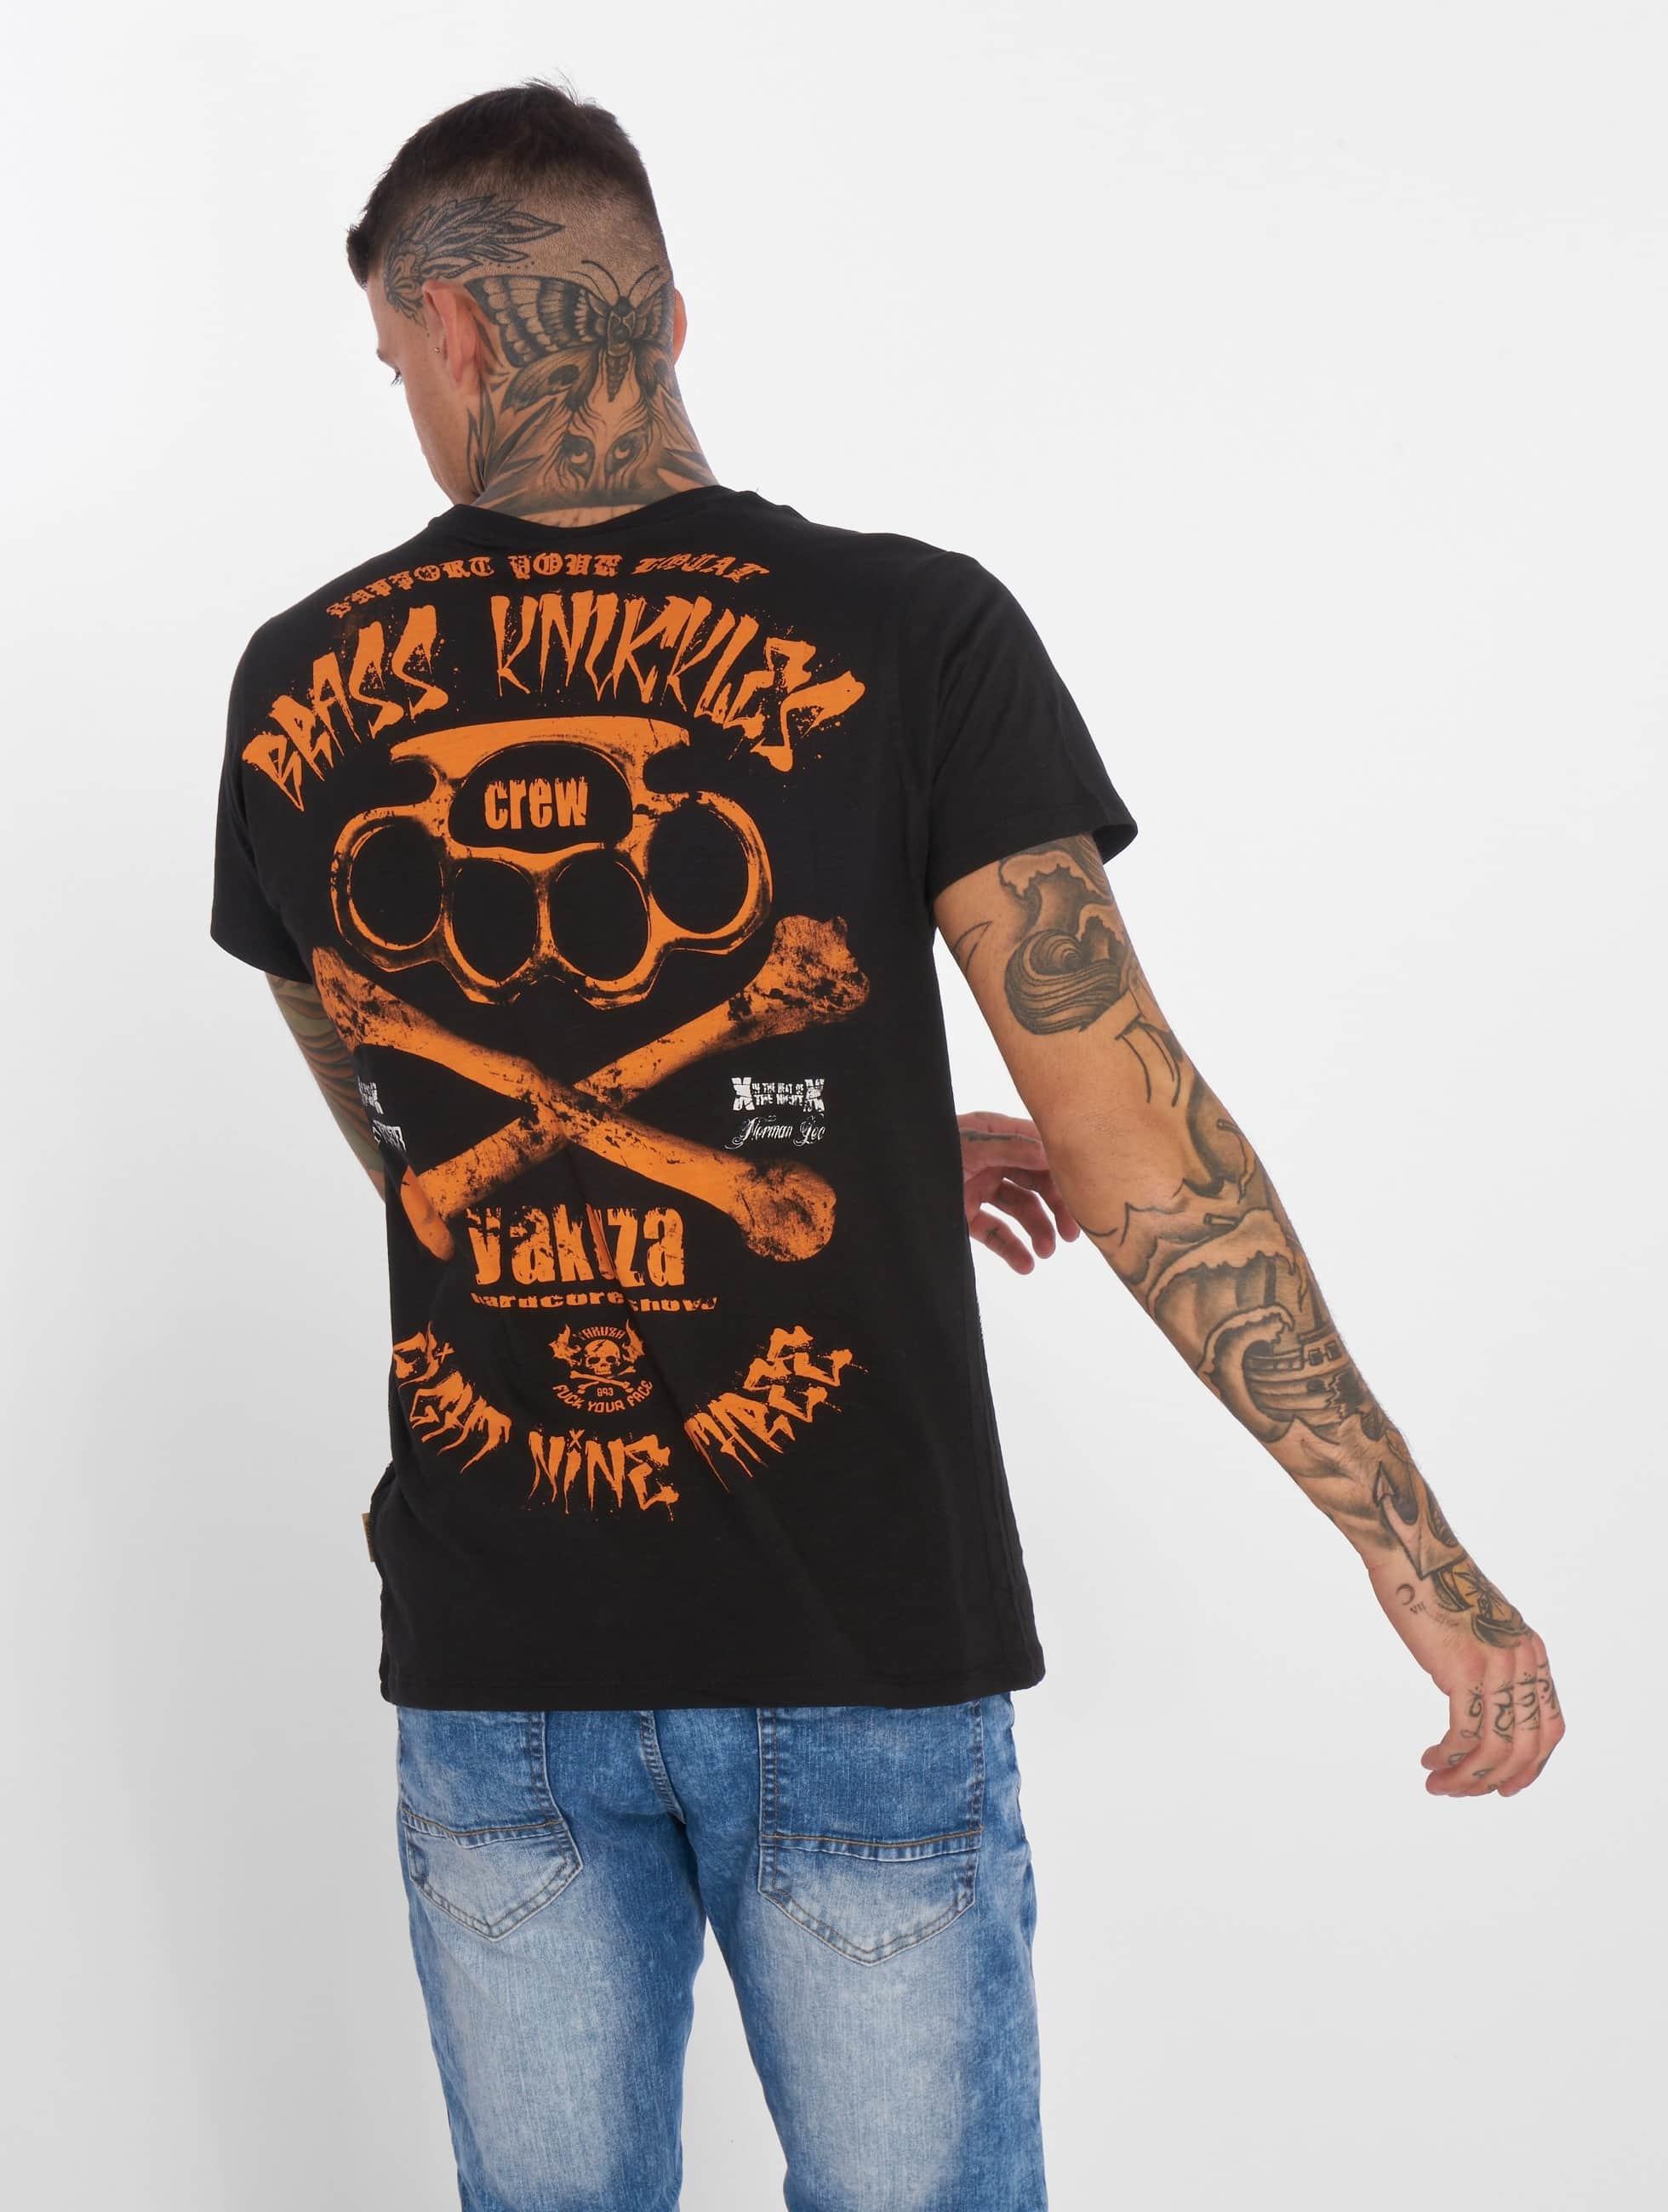 Yakuza T-Shirt Brass Knuckles Crew schwarz